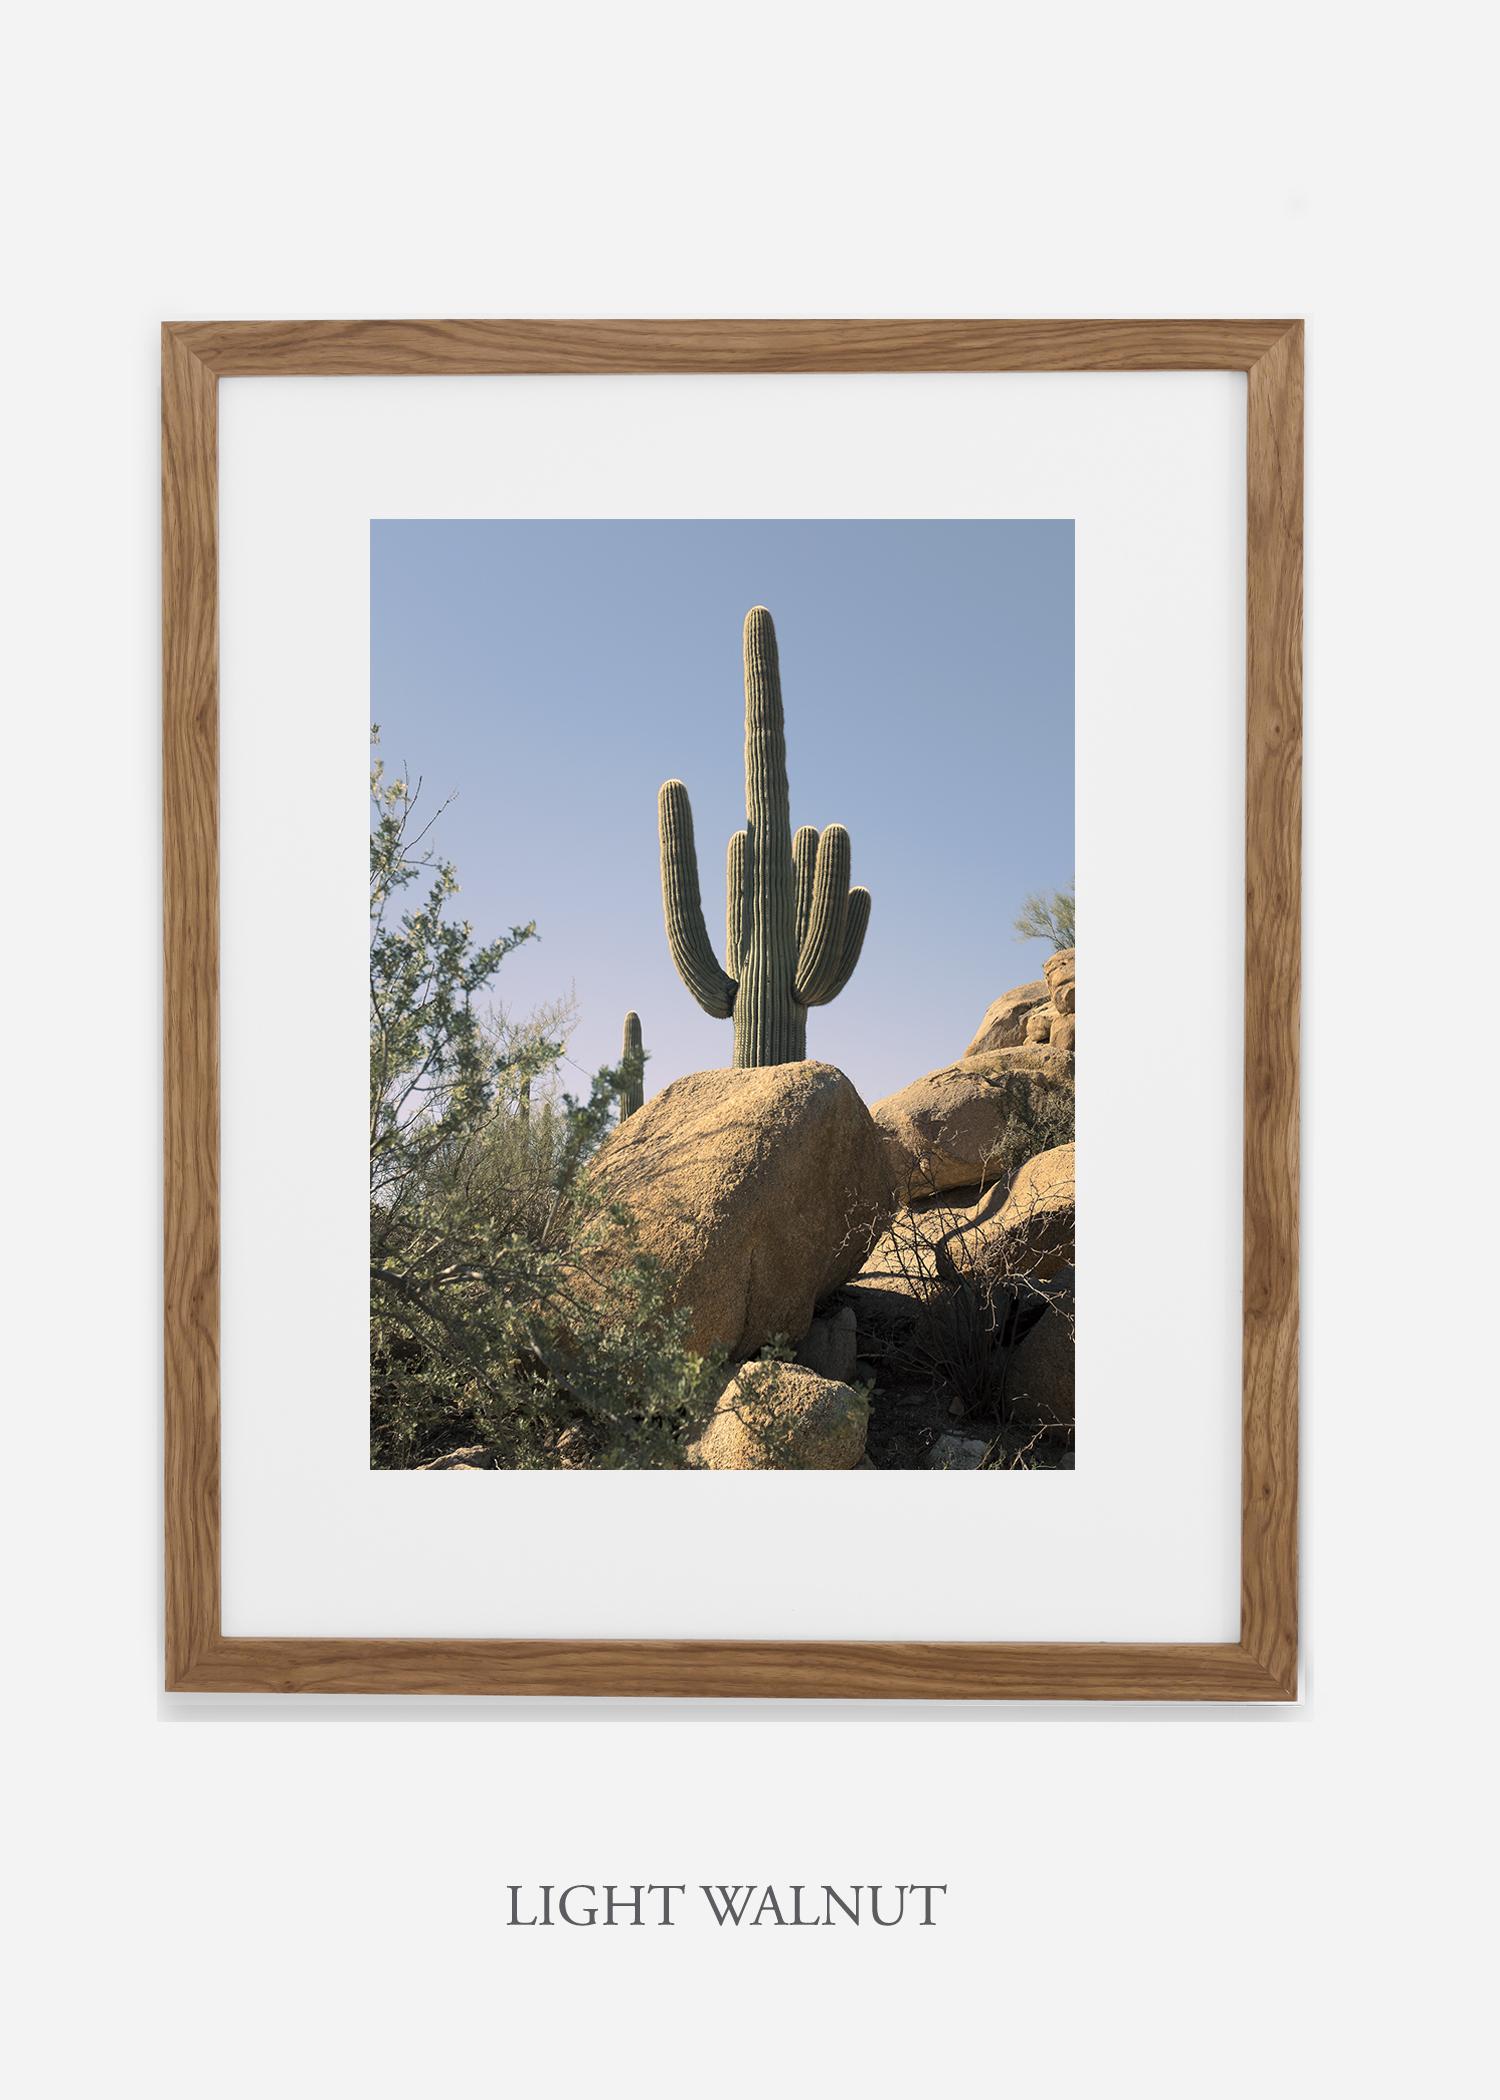 lightwalnutframe-saguaroNo.14-wildercalifornia-art-wallart-cactusprint-homedecor-prints-arizona-botanical-artwork-interiordesign.jpg